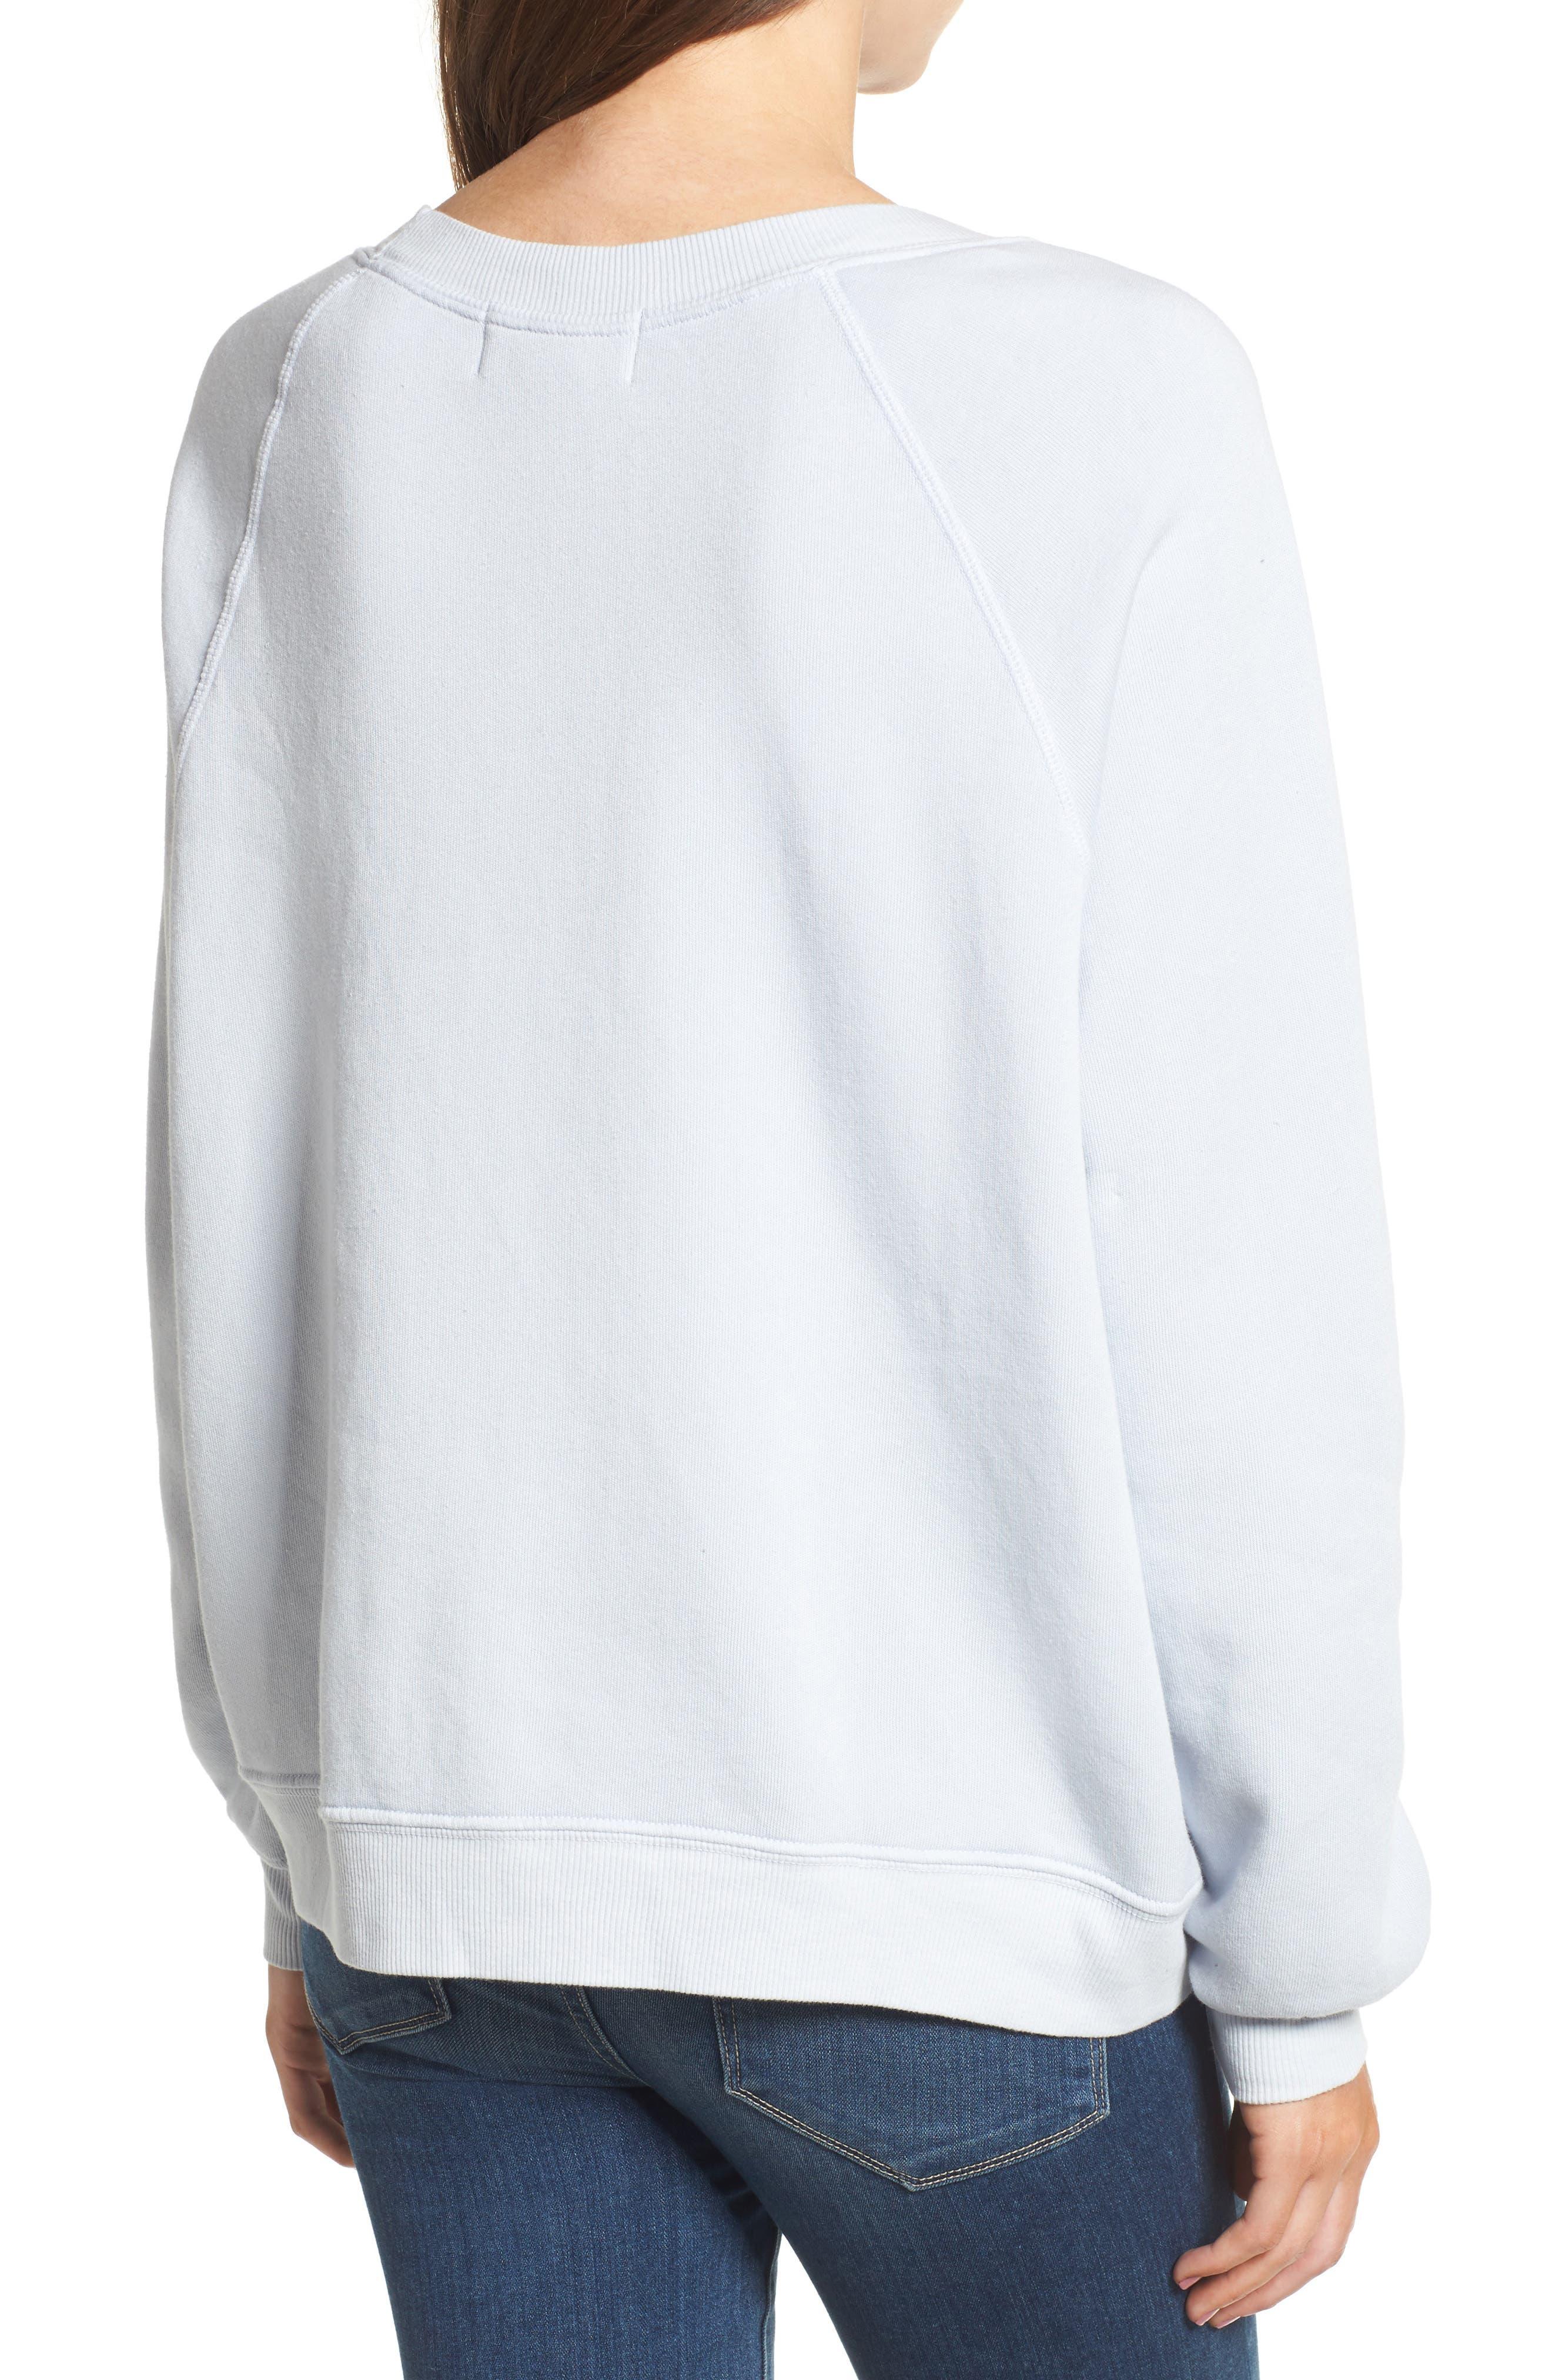 Extreme Snacker Sweatshirt,                             Alternate thumbnail 2, color,